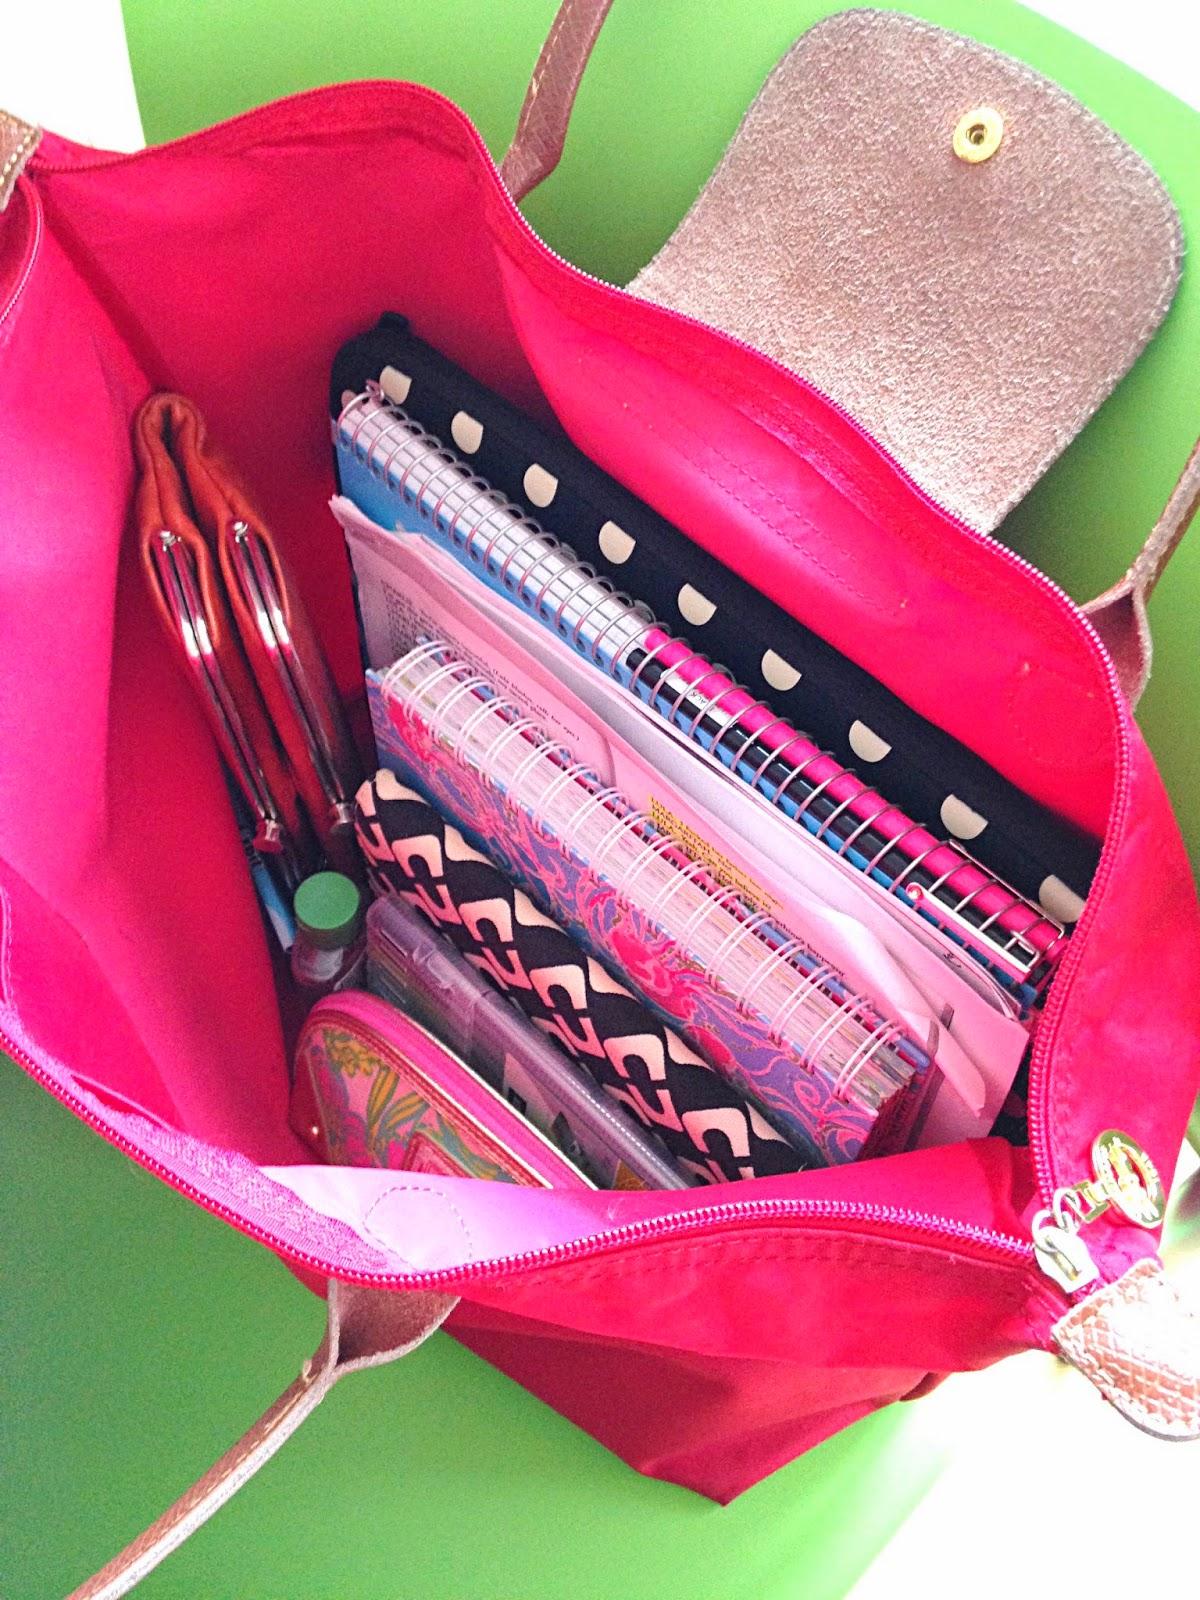 Handbags Amp Heartbeats What S In My School Bag